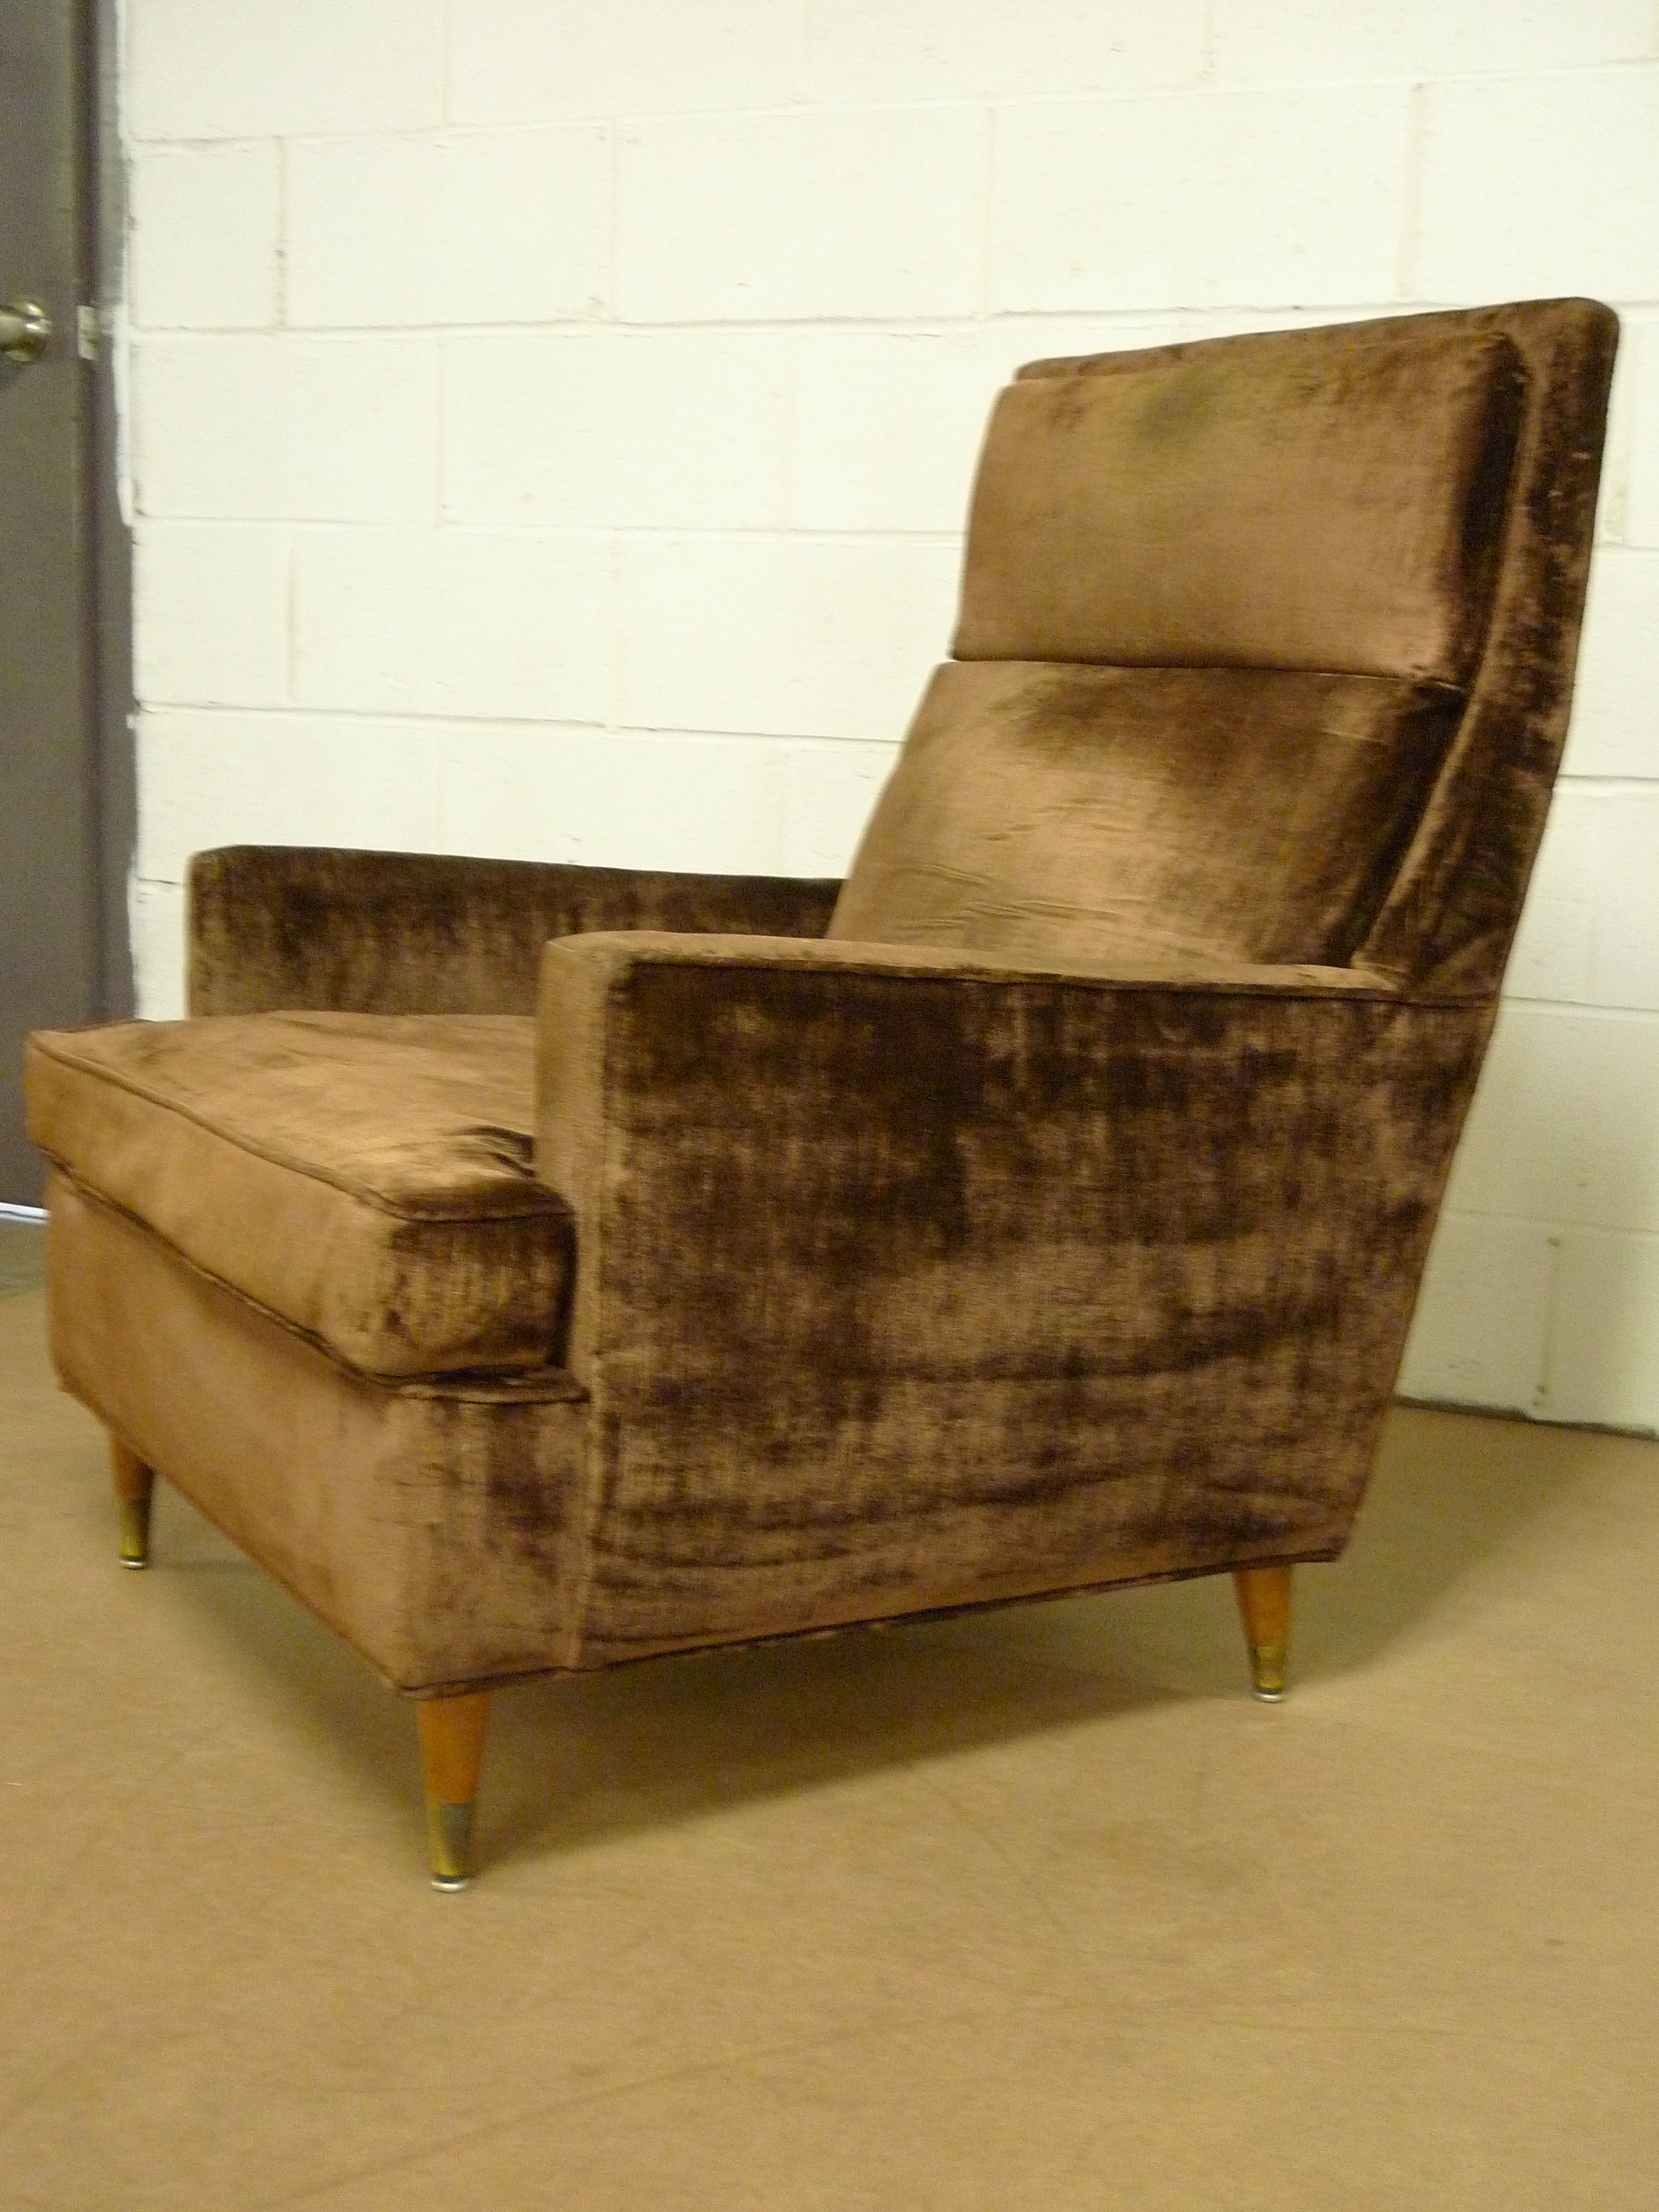 brown cushion armrest chair welcome to olek lejbzon shopping site by olek inc. Black Bedroom Furniture Sets. Home Design Ideas